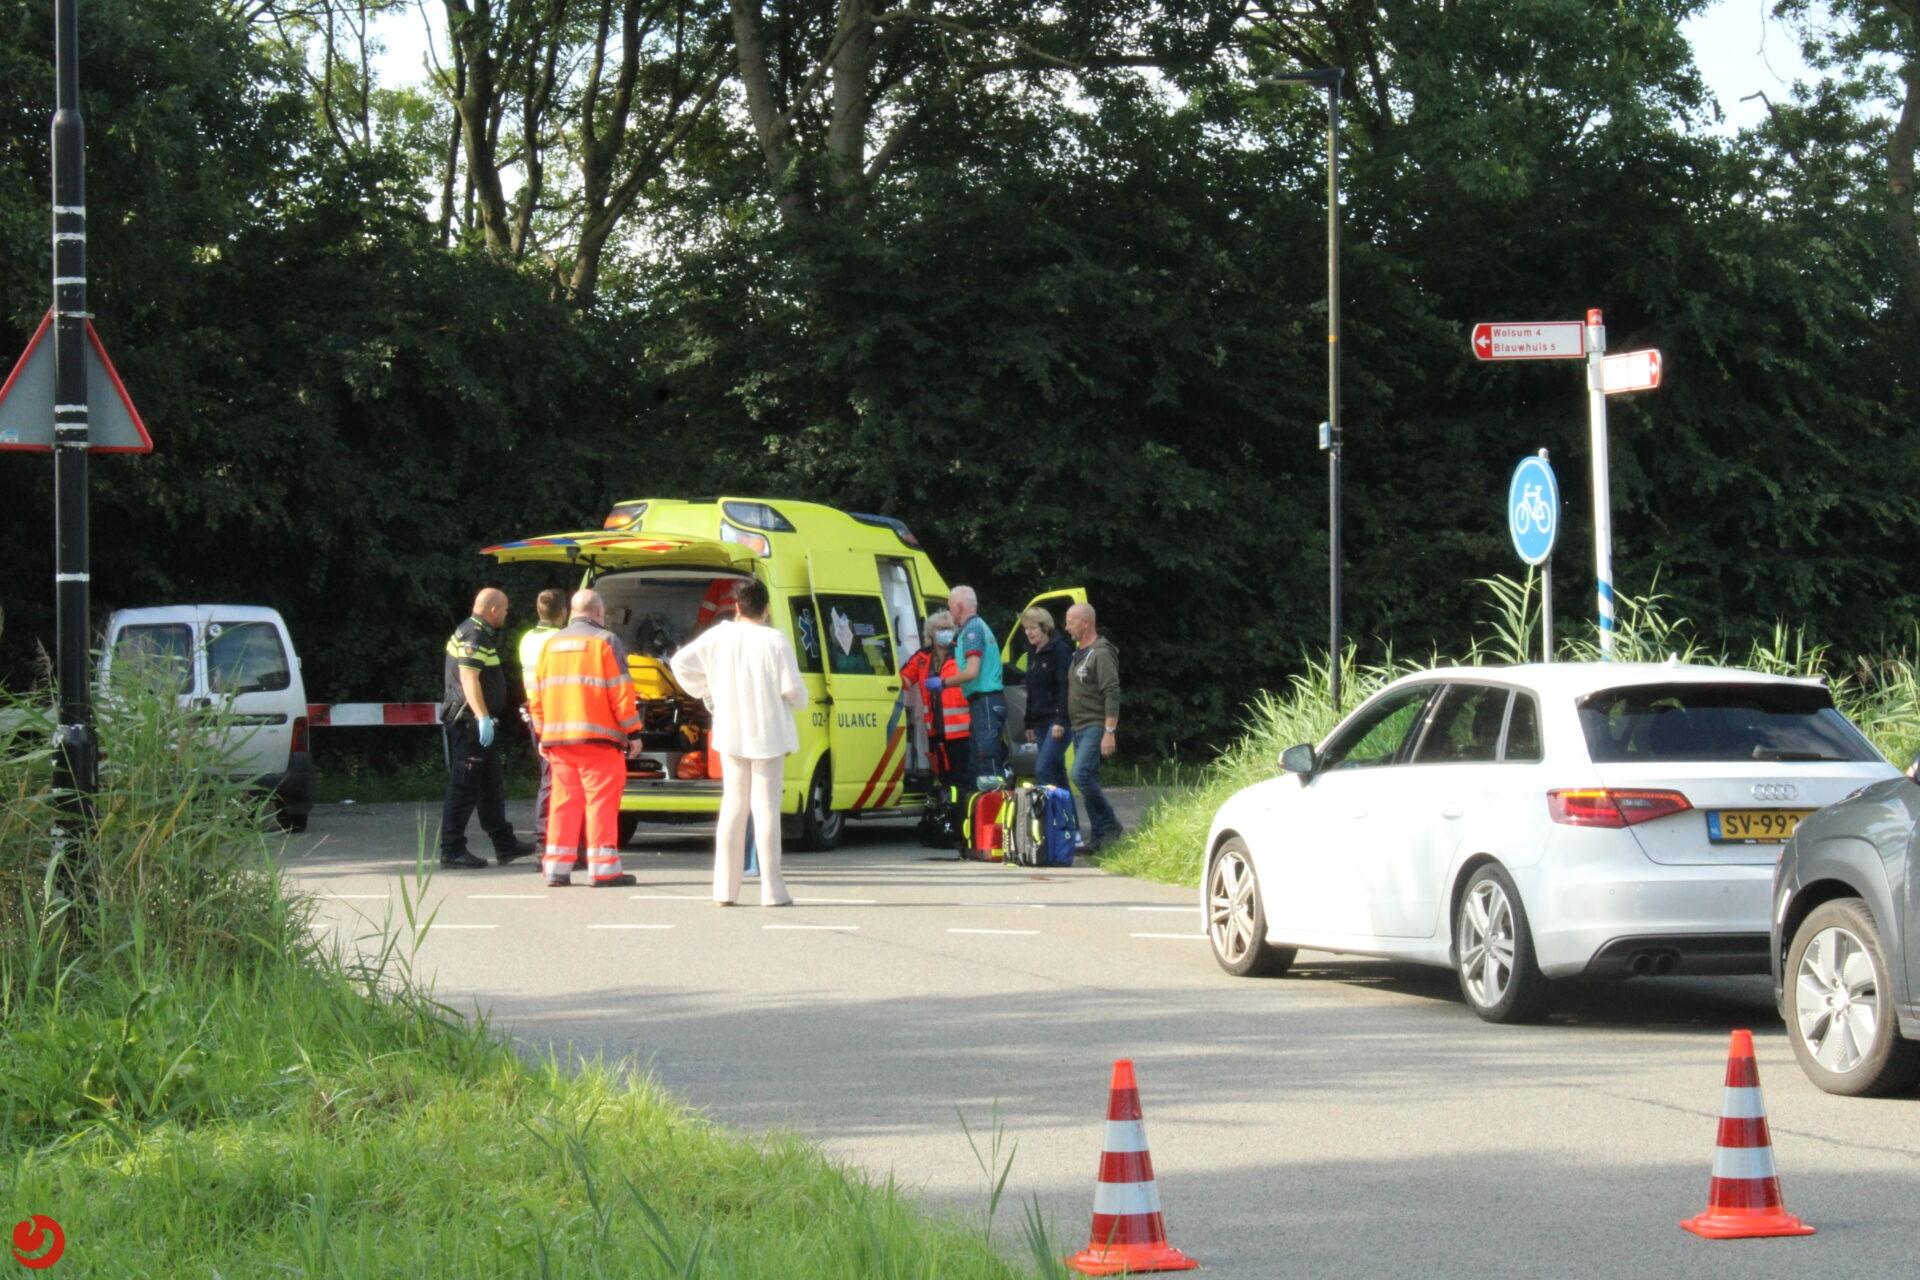 Fietser ernstig gewond na val met fiets in Bolsward